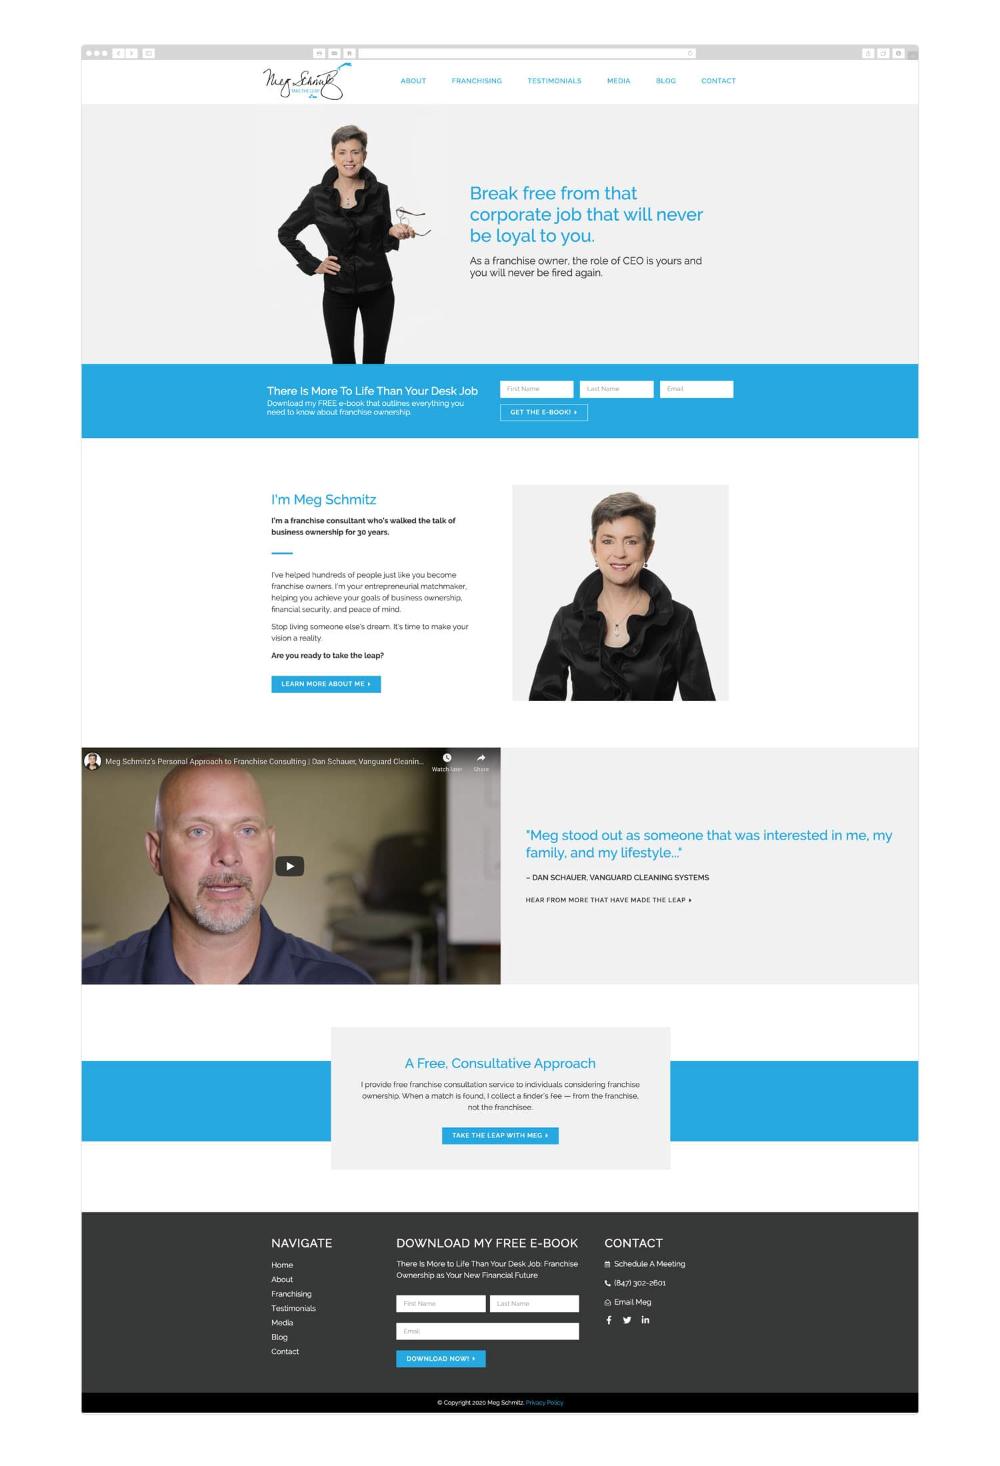 Meg Schmitz Wicky Design In 2020 Responsive Web Design Inspiration Wordpress Website Design Web Layout Design